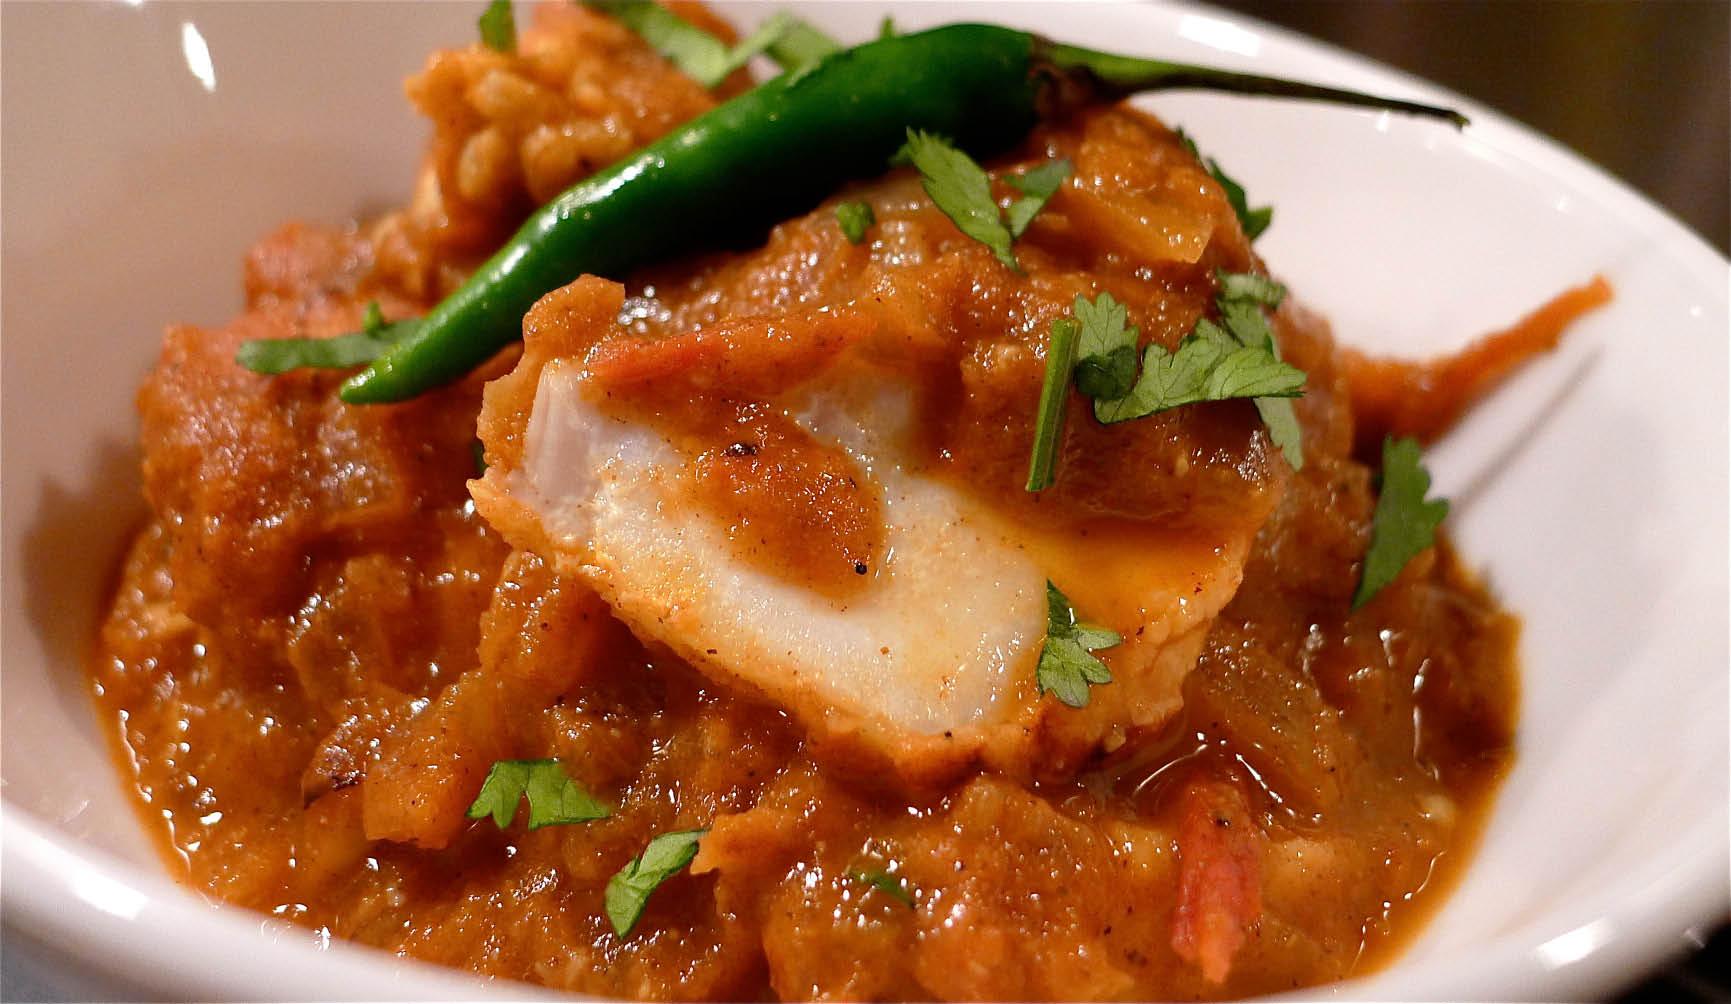 Fish Curry Mehran Restaurant & Catering  in Newark